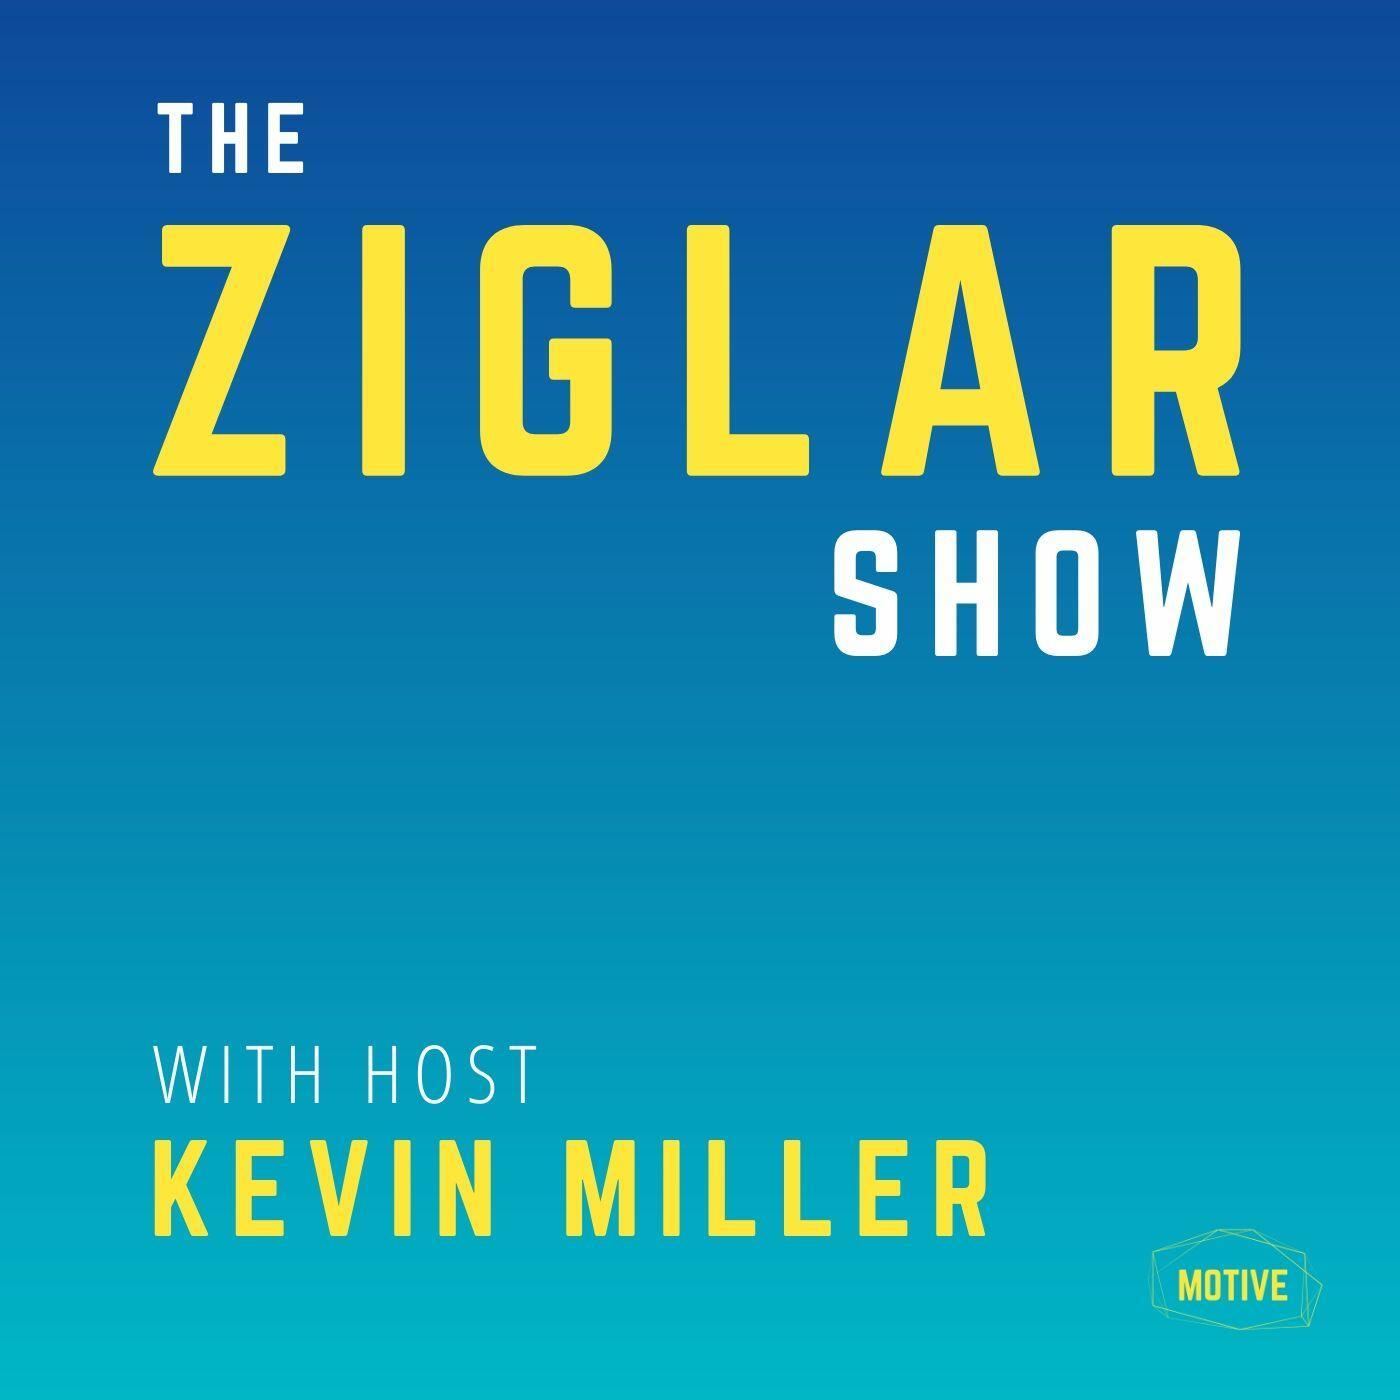 The Ziglar Show